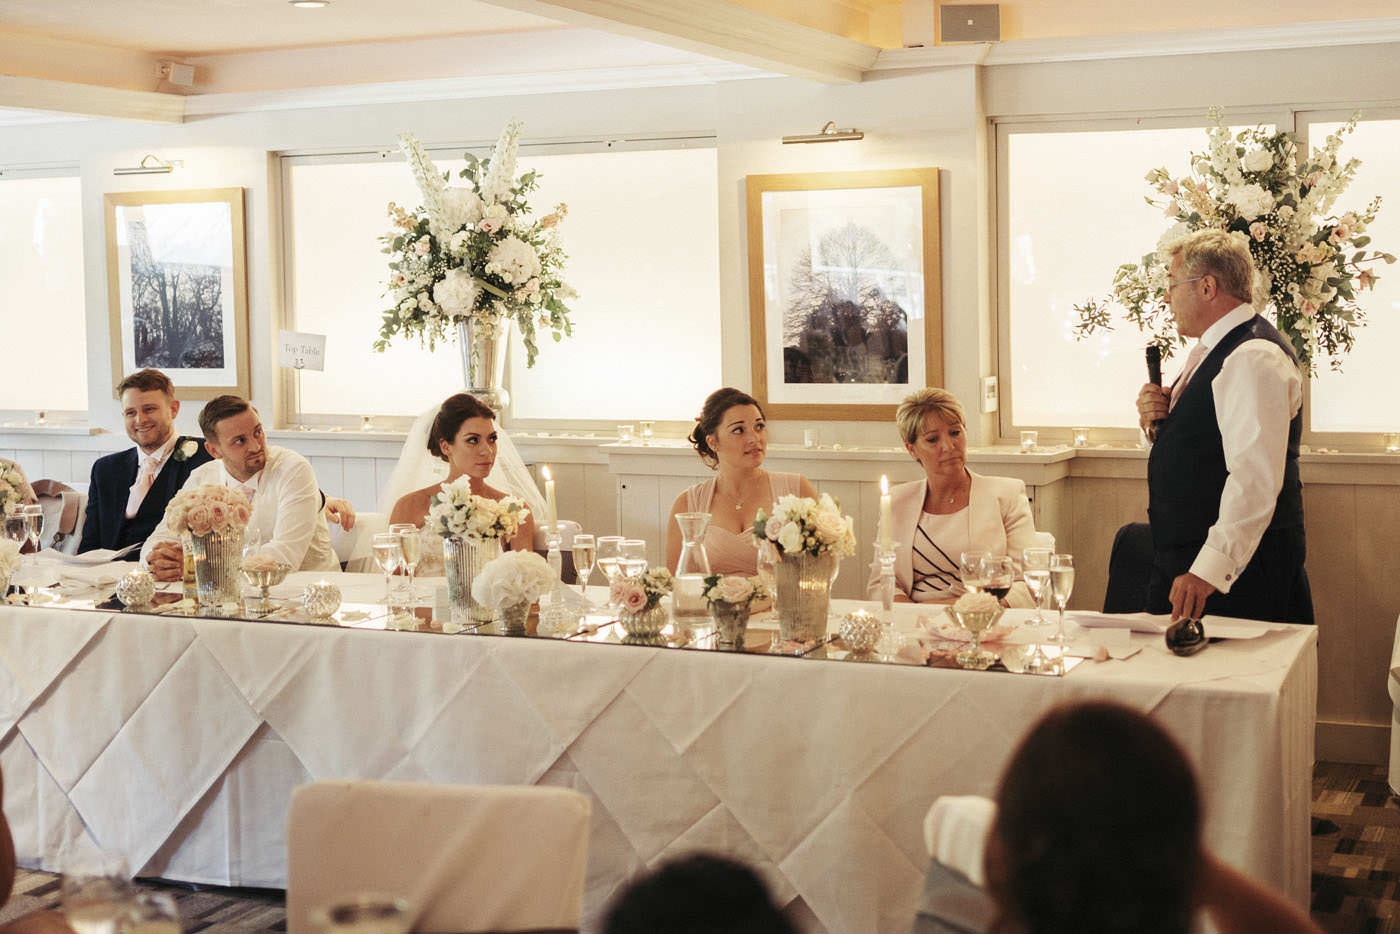 lukeemily foxhills wedding photographer 0115